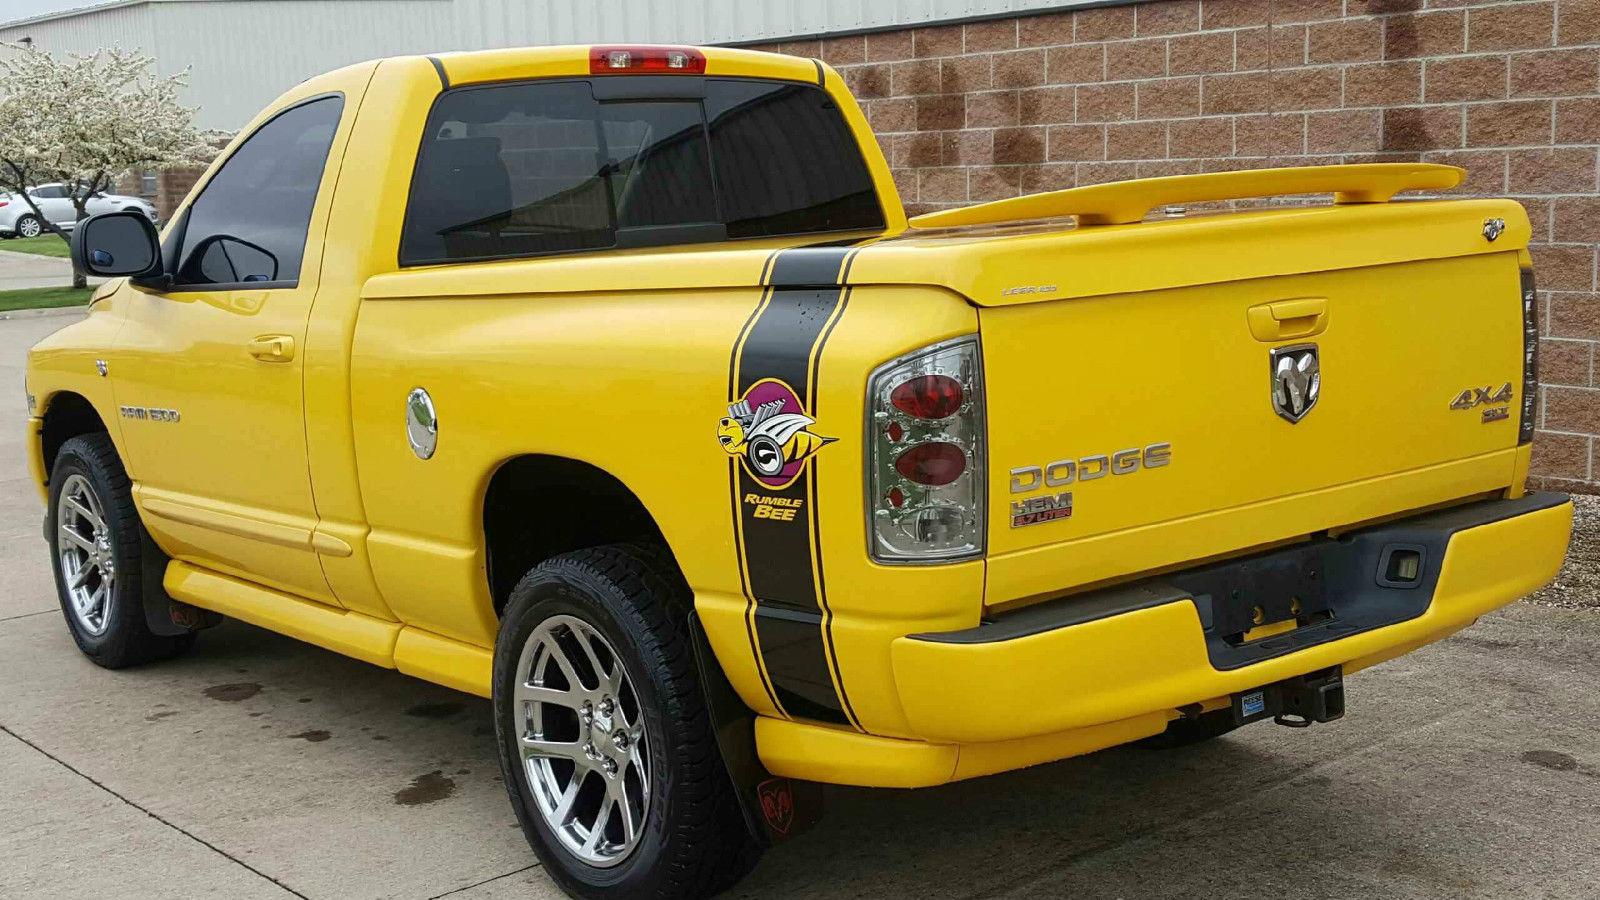 2004 Dodge Ram 1500 Rumble Bee (Jeff Pick)